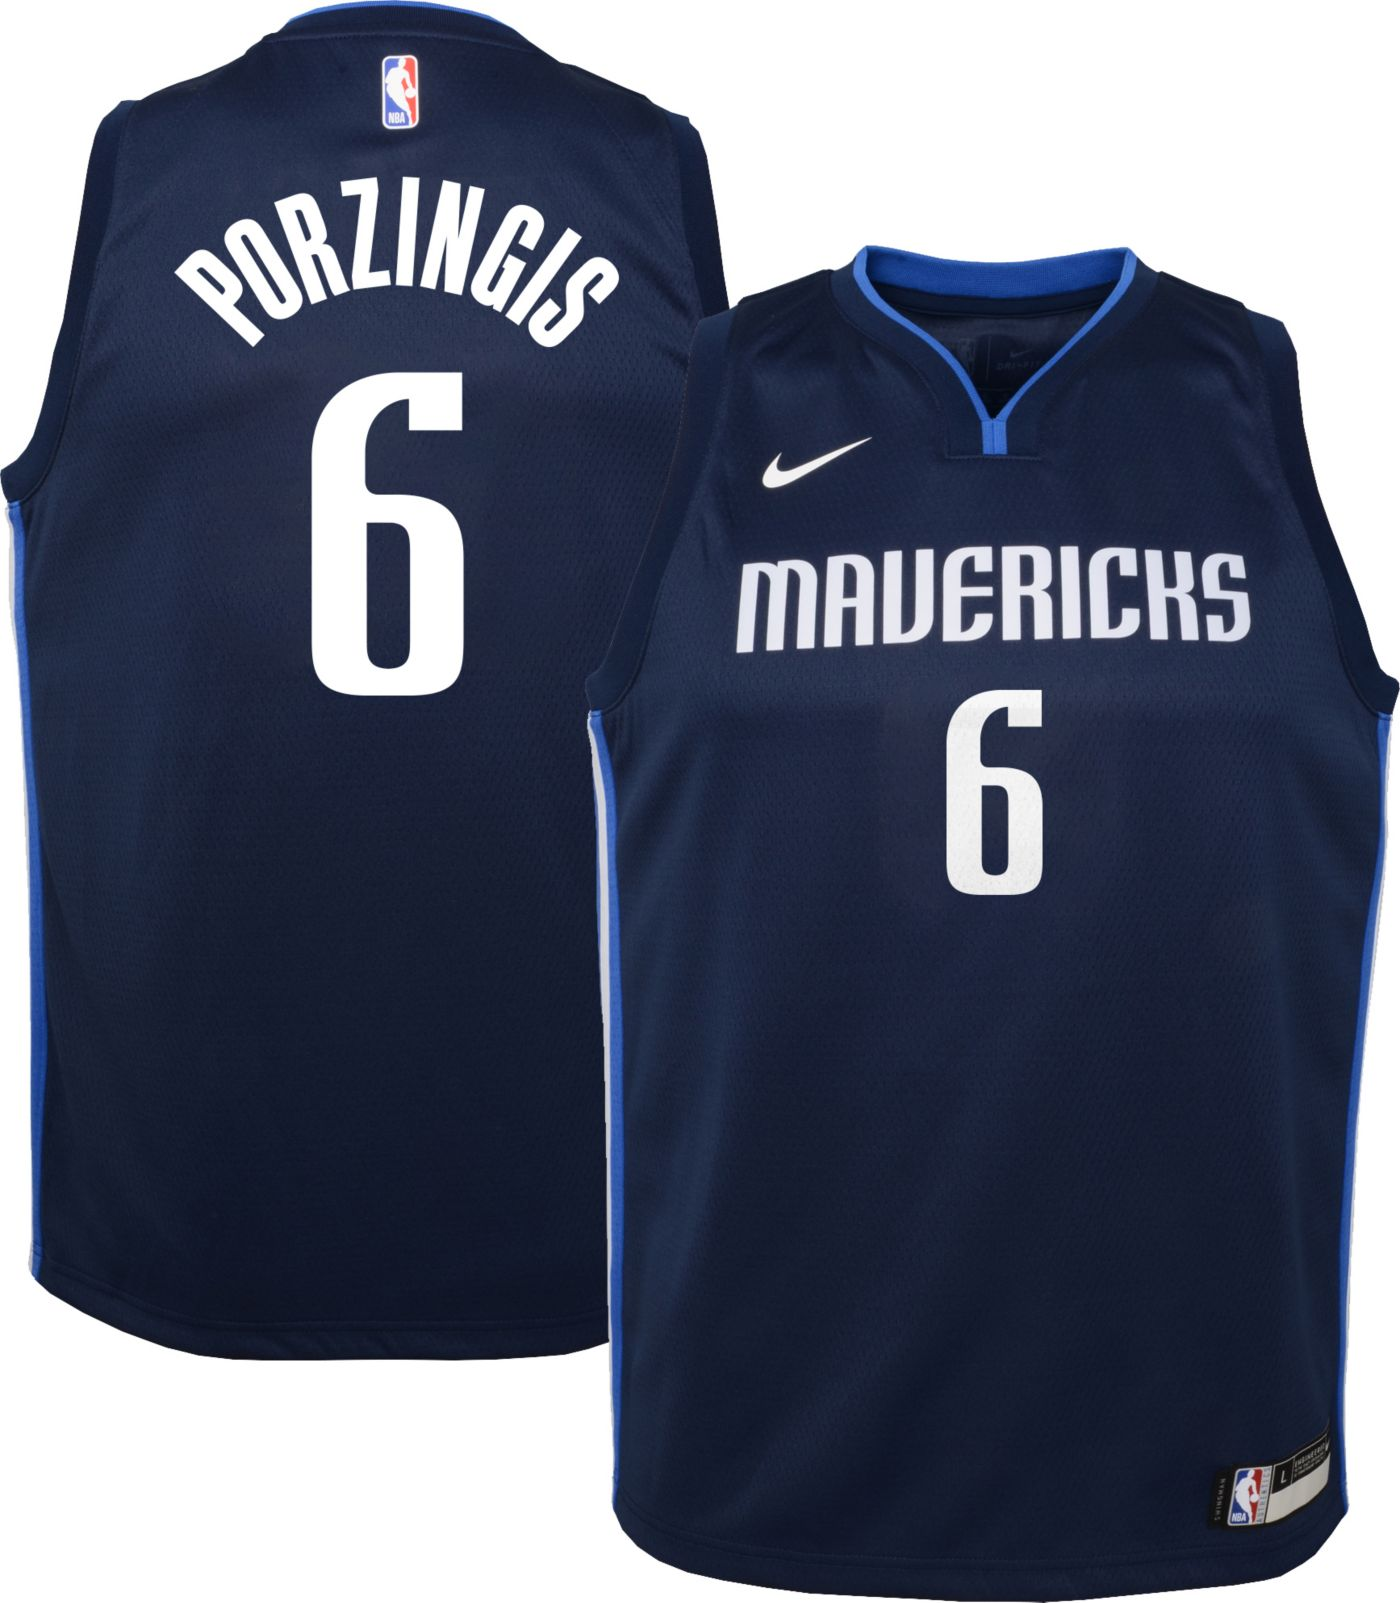 Nike Youth Dallas Mavericks Kristaps Porzingis #6 Navy Dri-FIT Statement Swingman Jersey